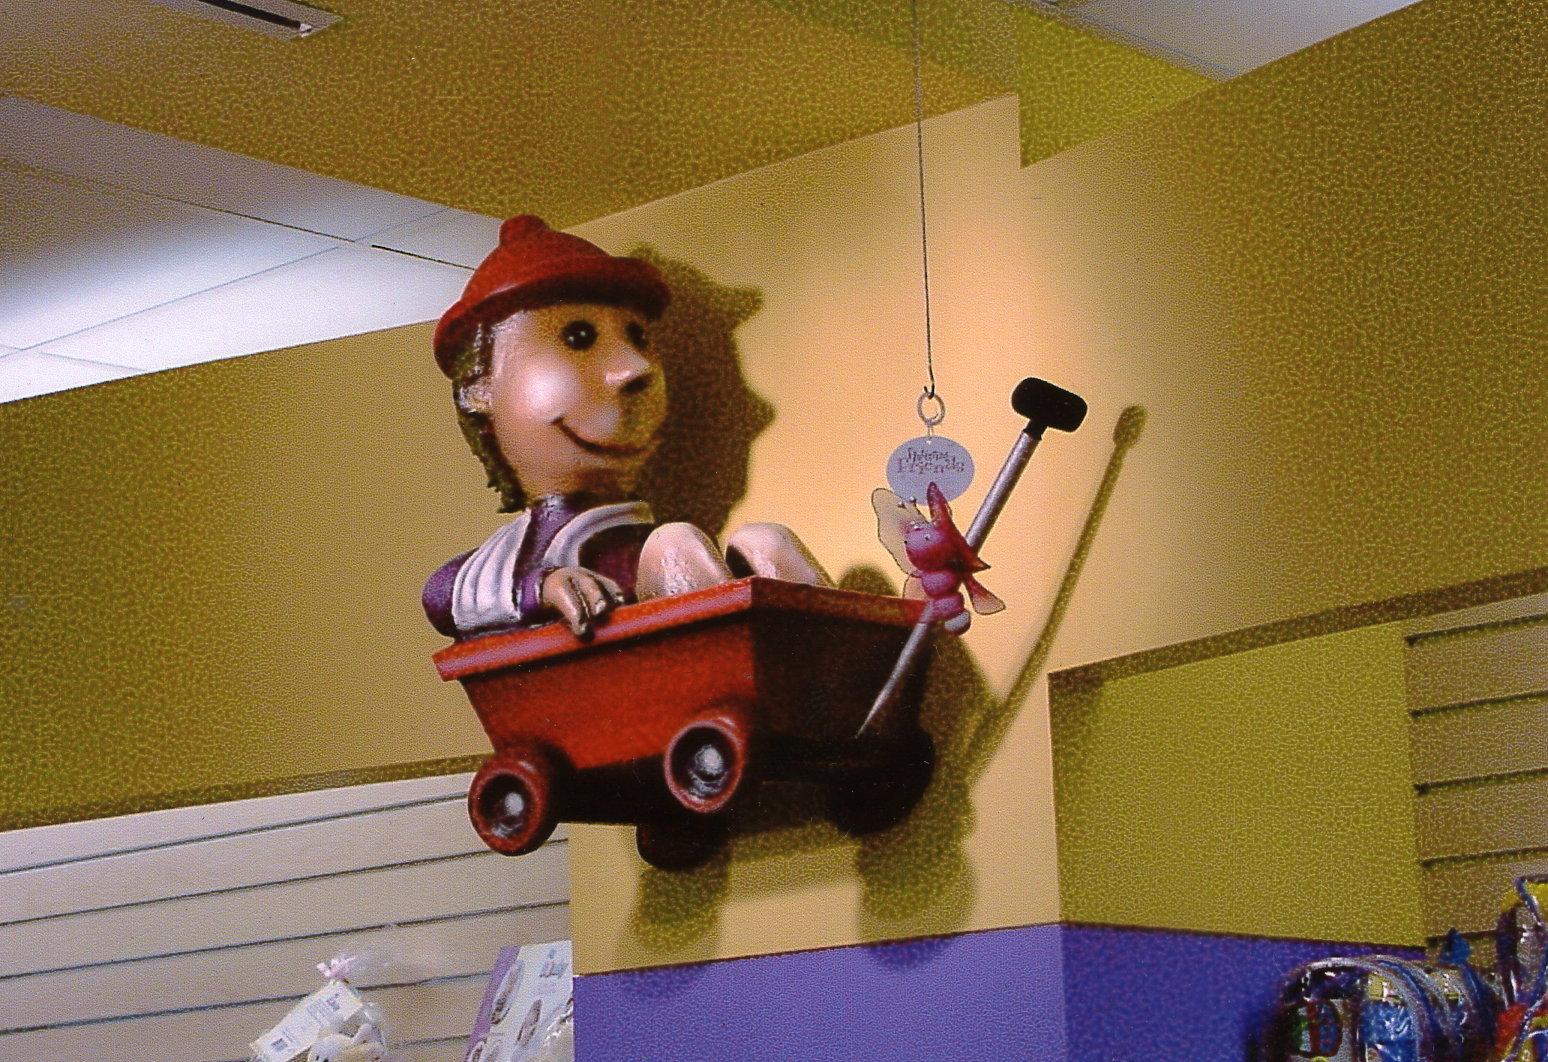 Dale Children's Hospital